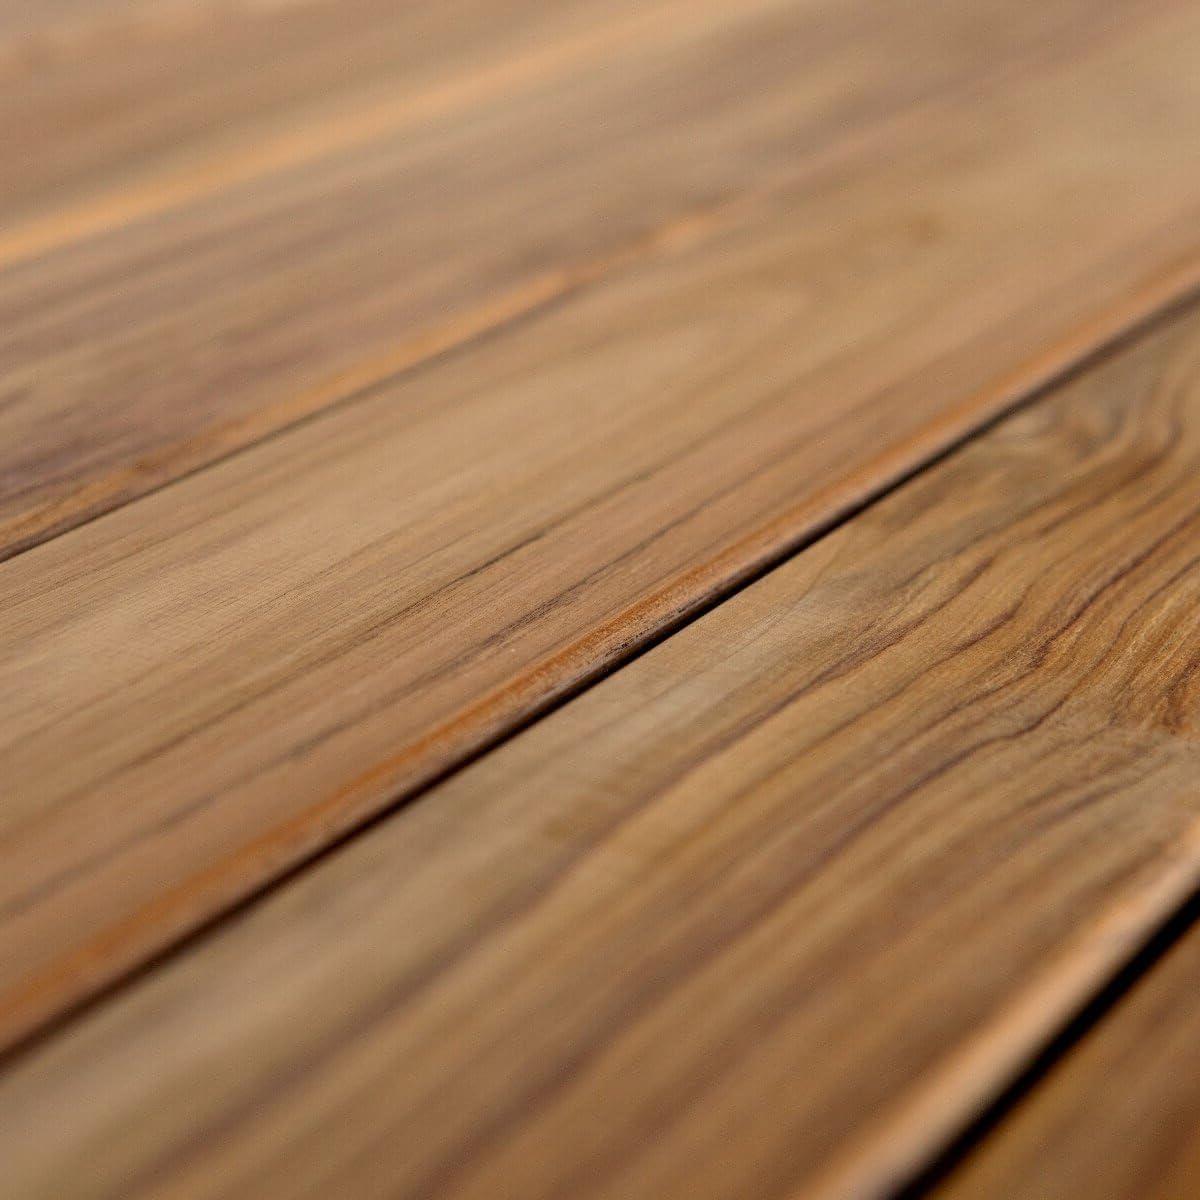 Tablones de terraza de madera de teca grosor 19 mm de BioMaderas/®; anchura 95 mm Marr/ón